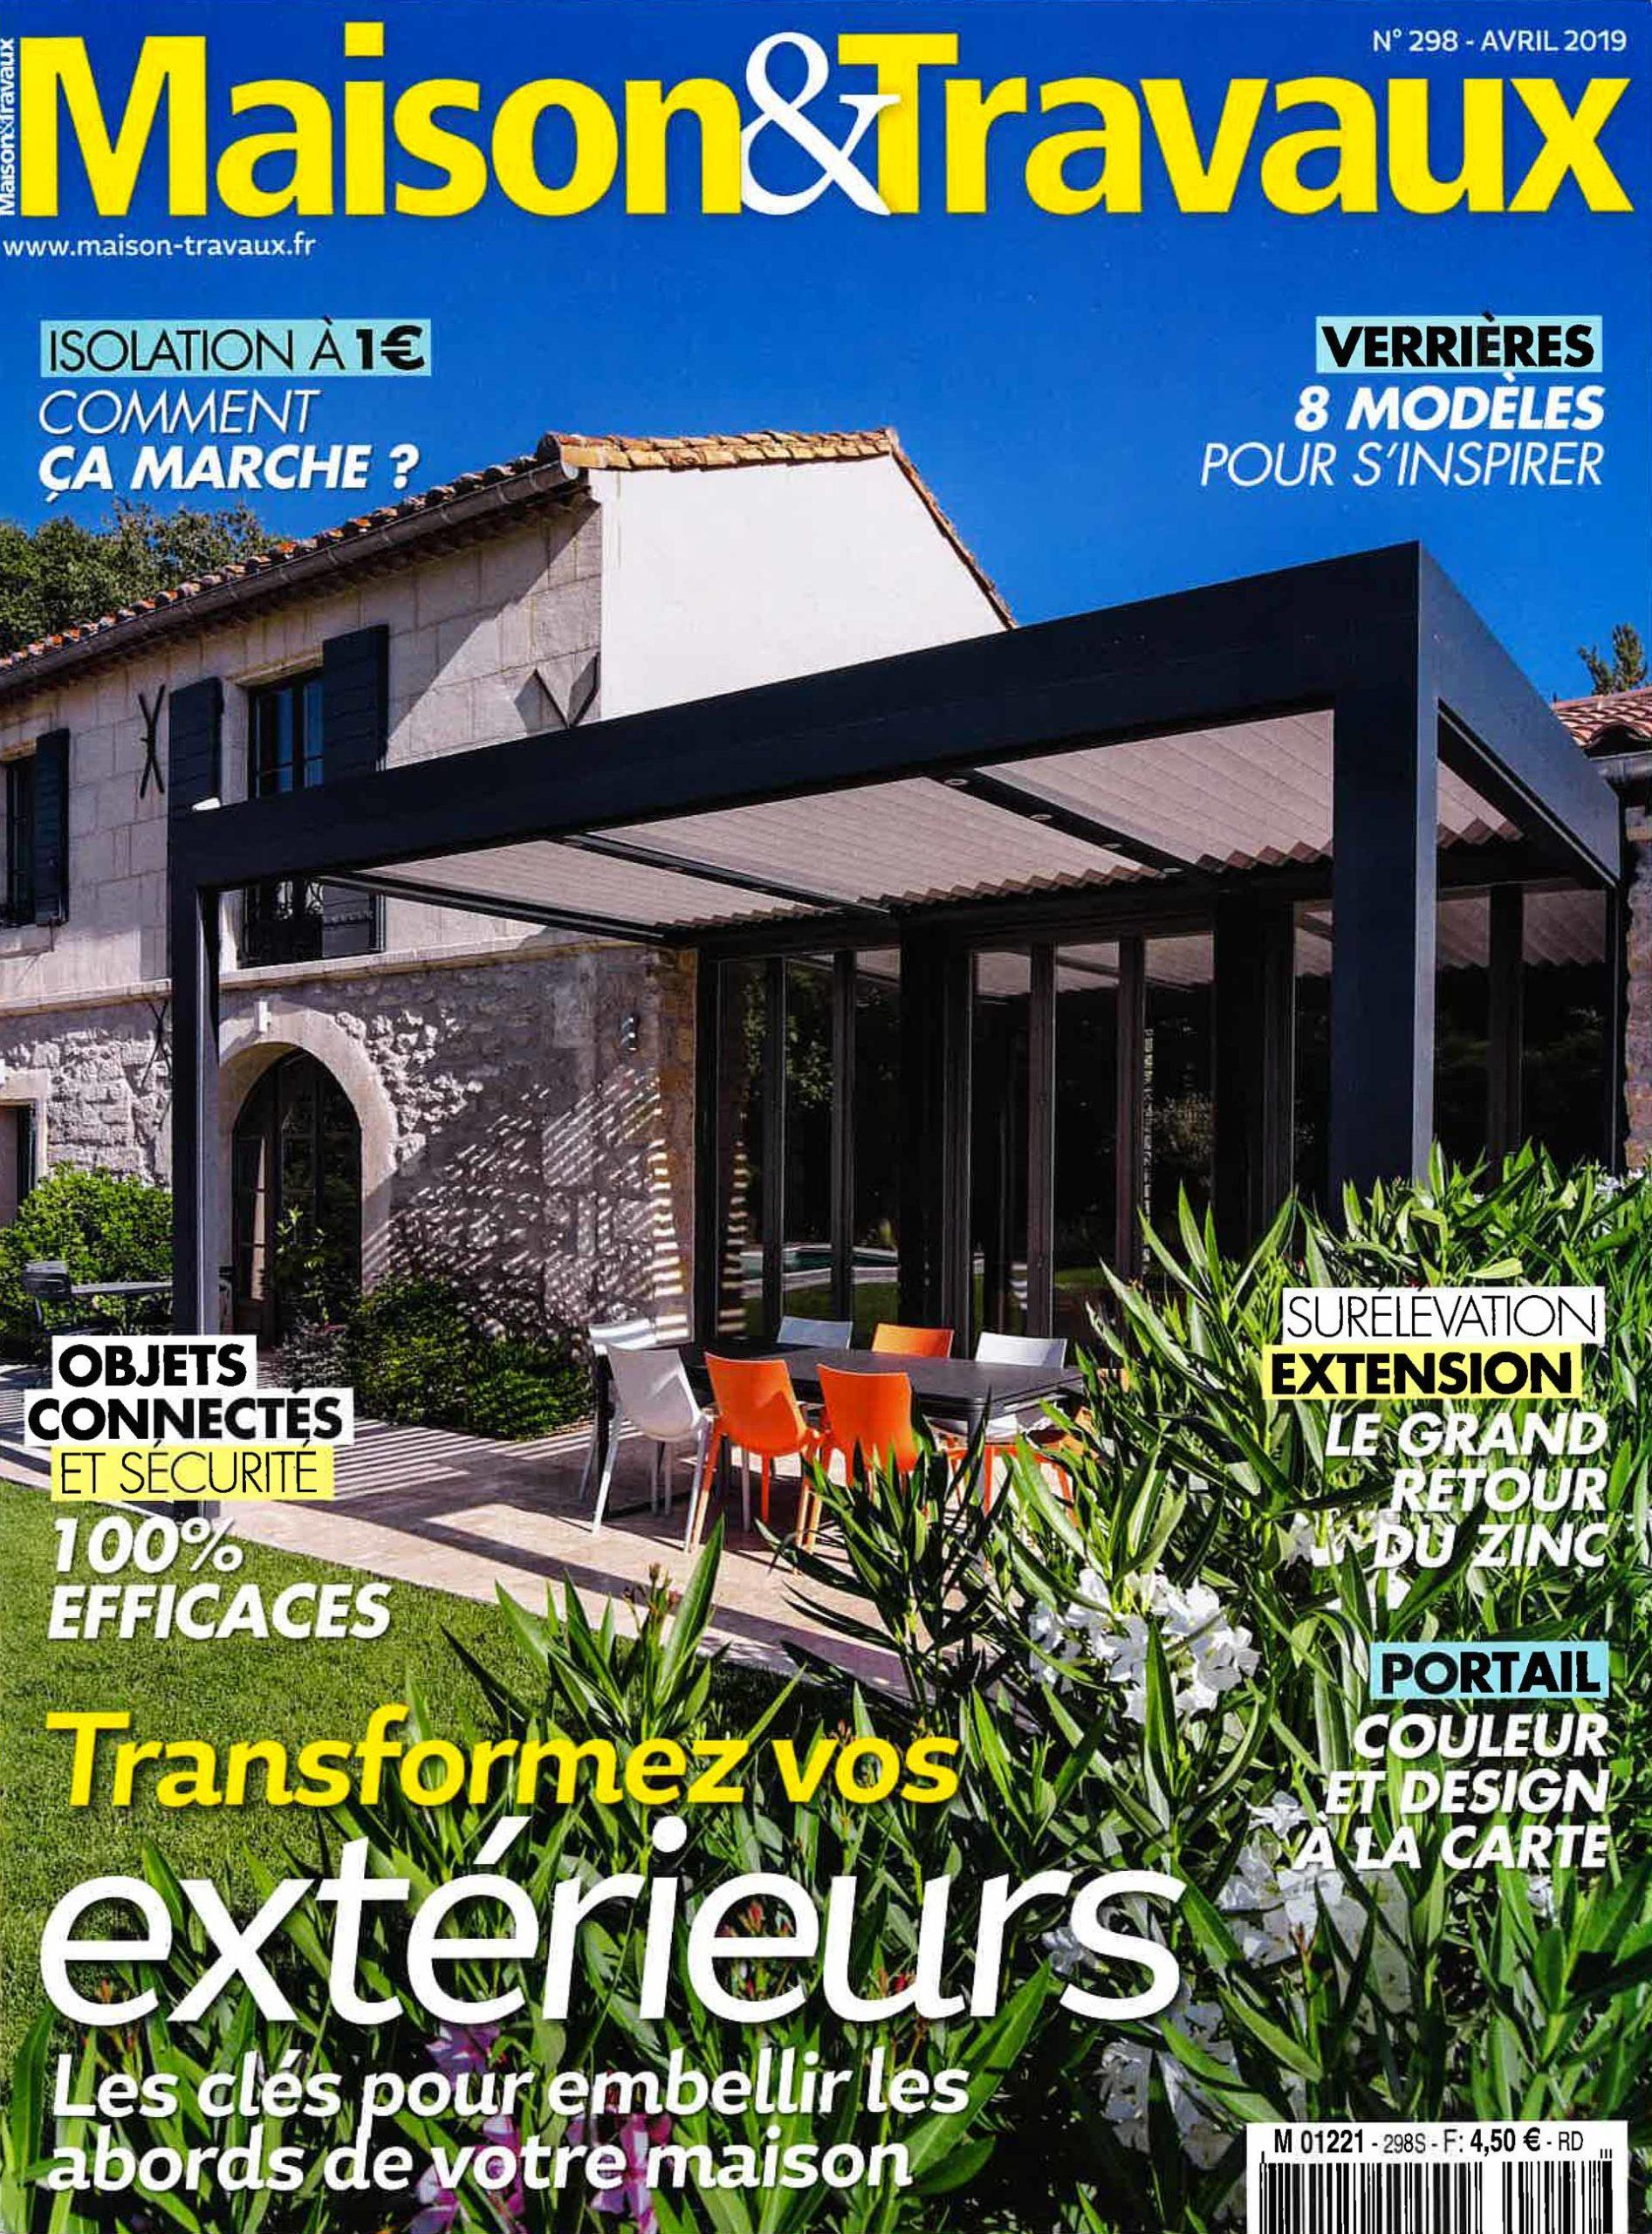 MAISON & TRAVAUX N°298 – AVRIL 2019